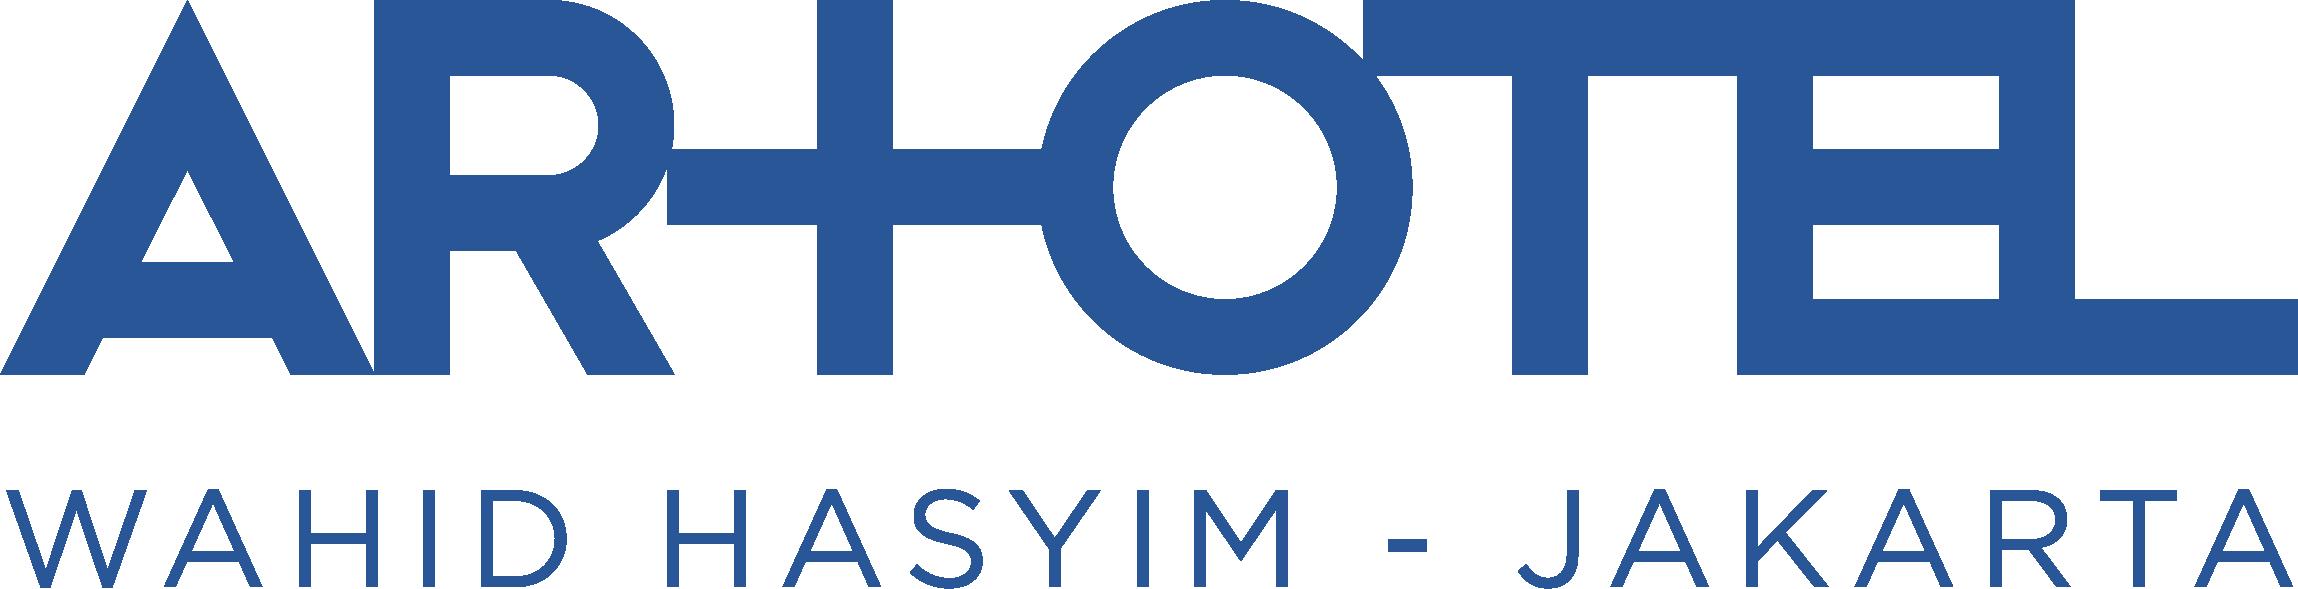 logo-artotel-wahid-hasyim